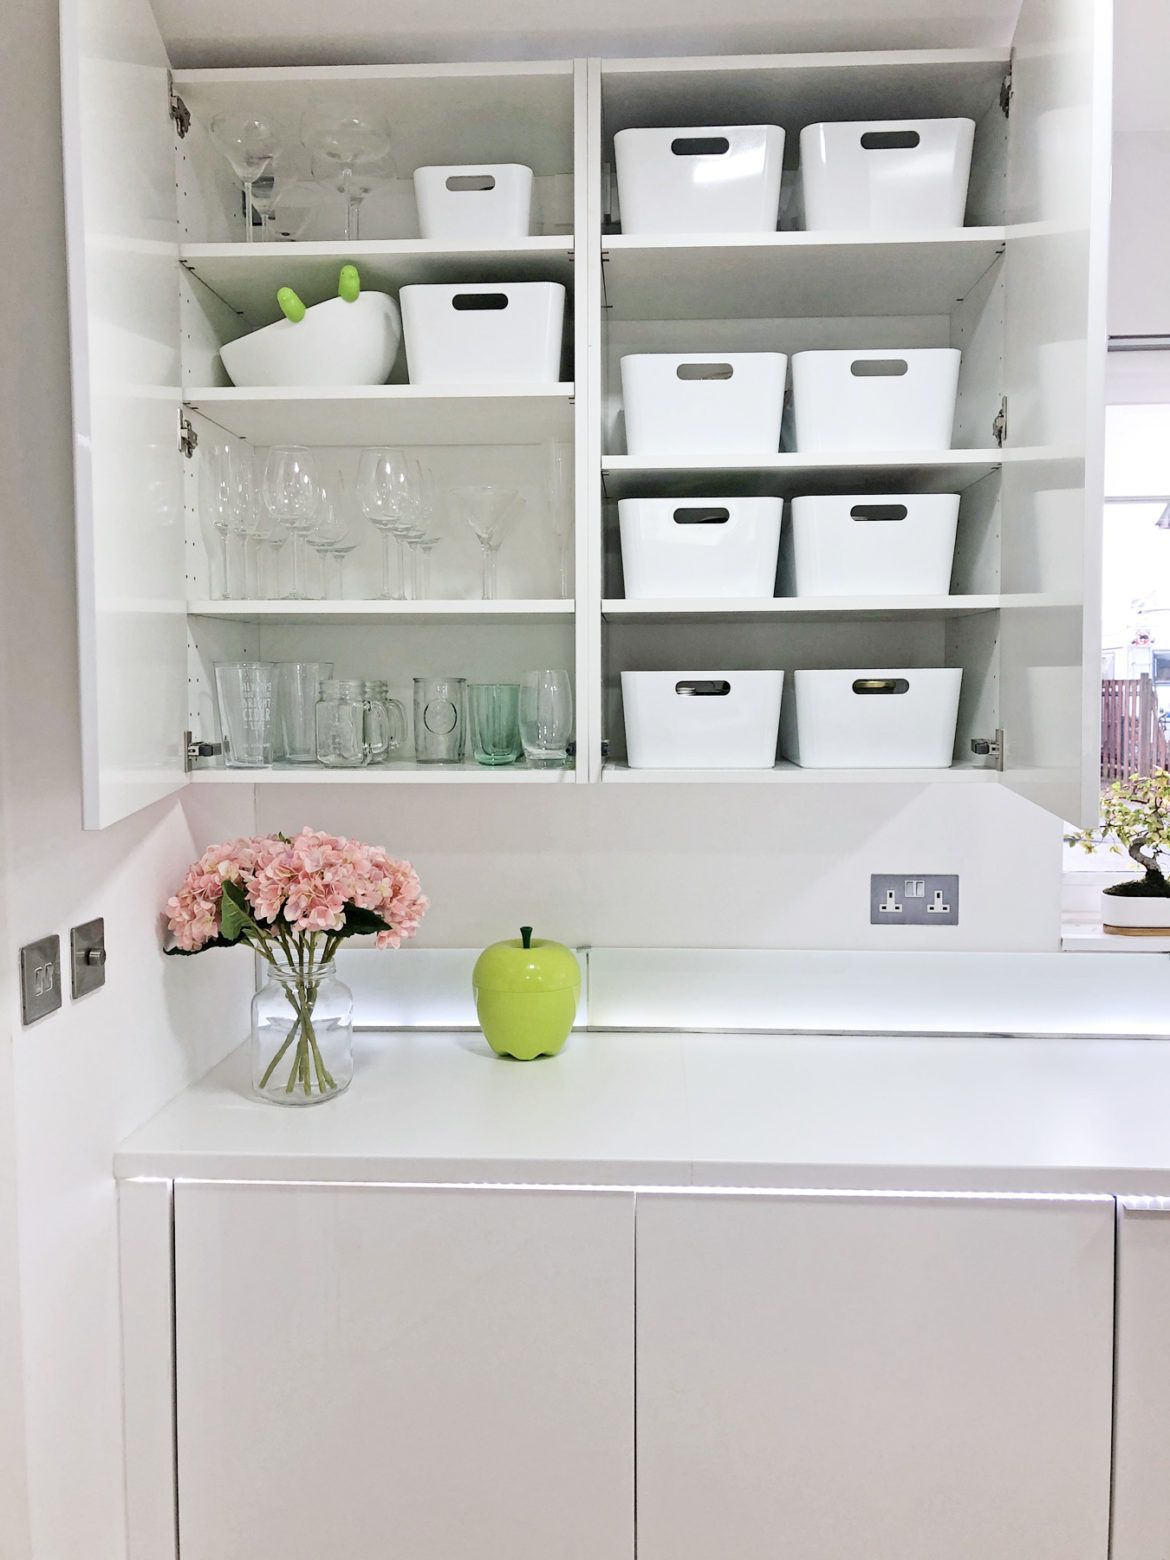 10 Ways To Use Ikea Storage Boxes To Organise Your Home Ikea Storage Boxes Ikea Kitchen Storage Ikea Storage